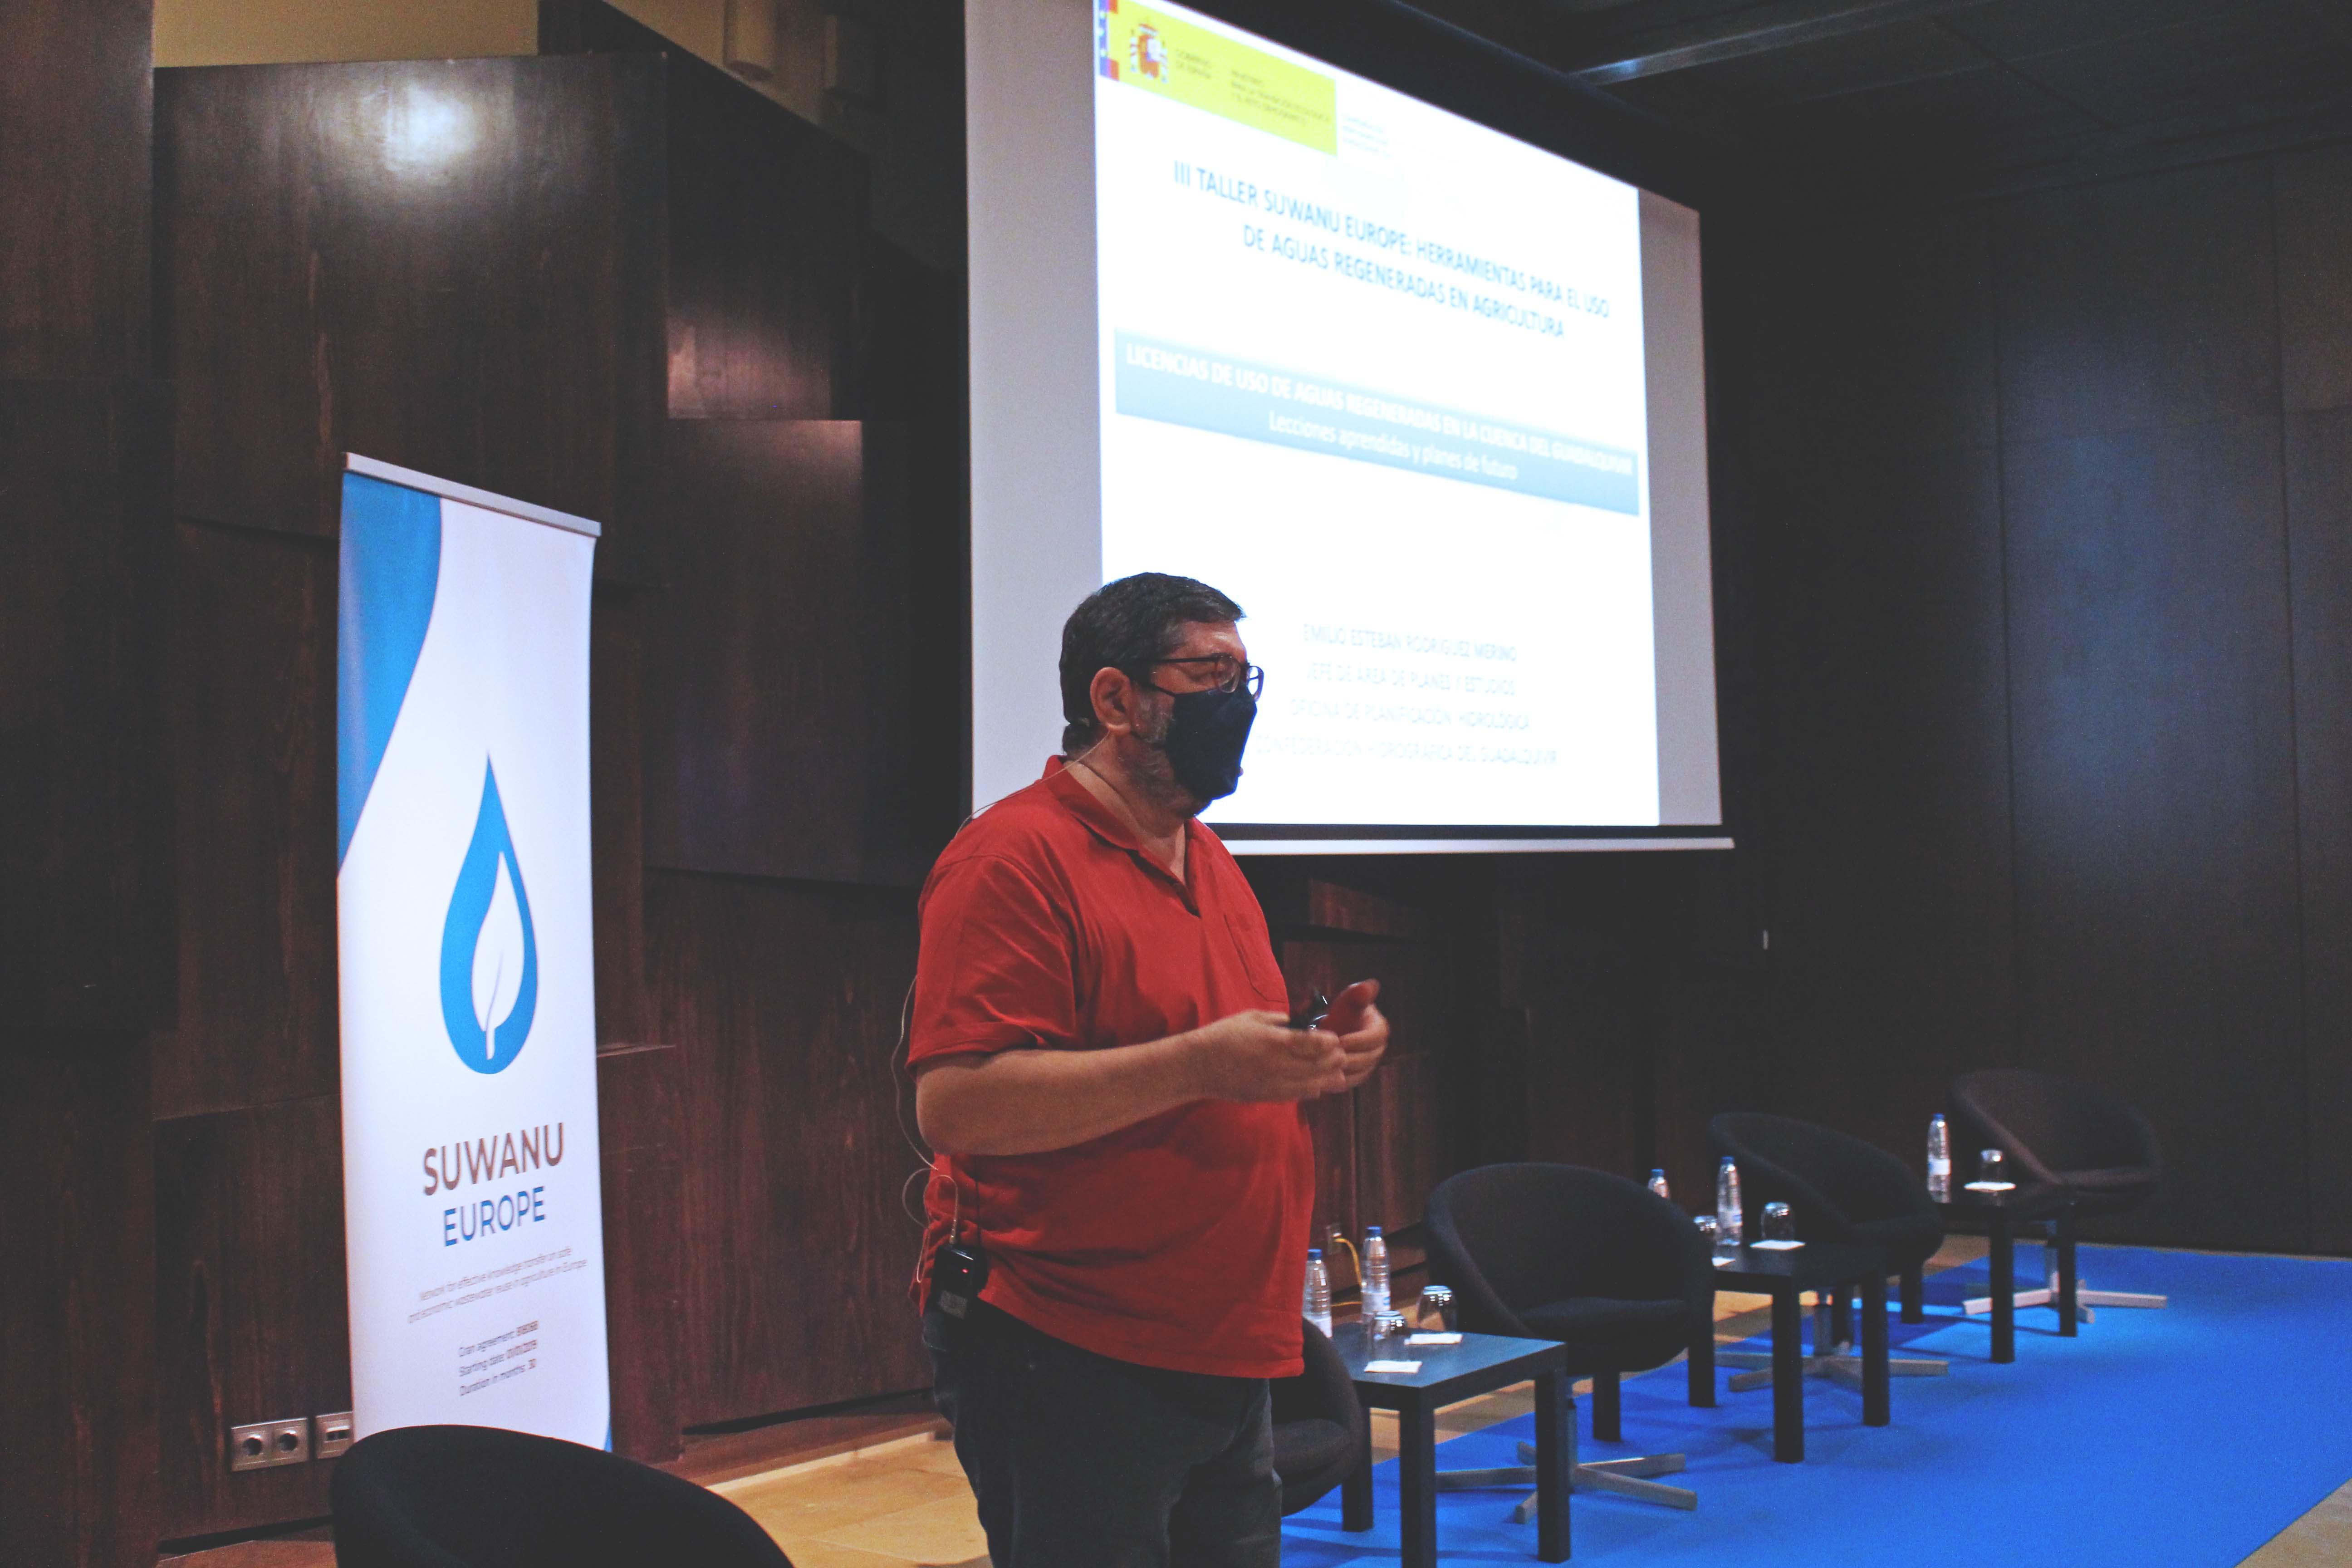 Emilio Rodríguez (CHG) presentation